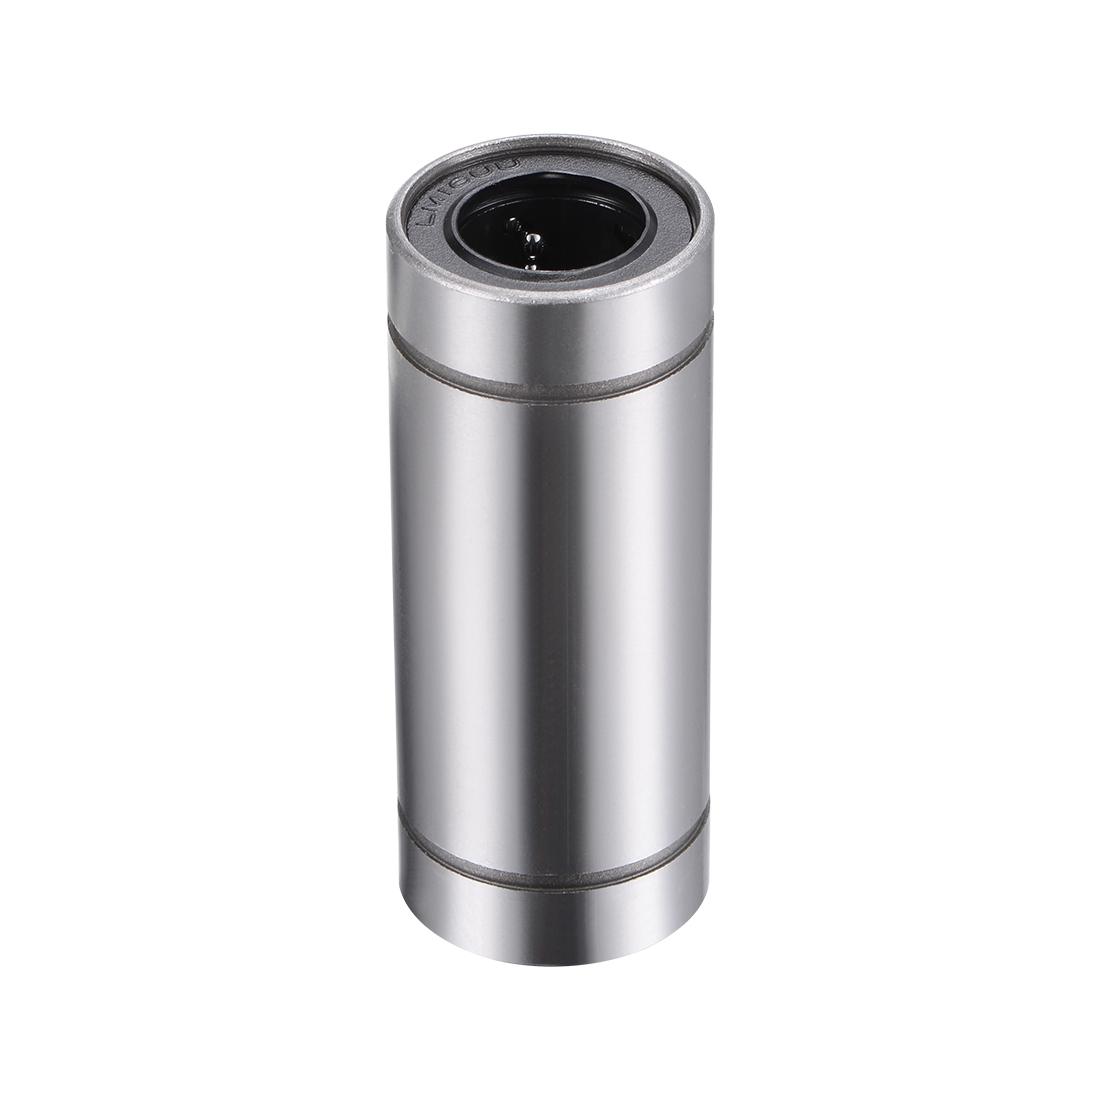 16mm Linear Ball Bearings Extra Long LM16LUU, 16mm Bore, 28mm OD, 70mm Length